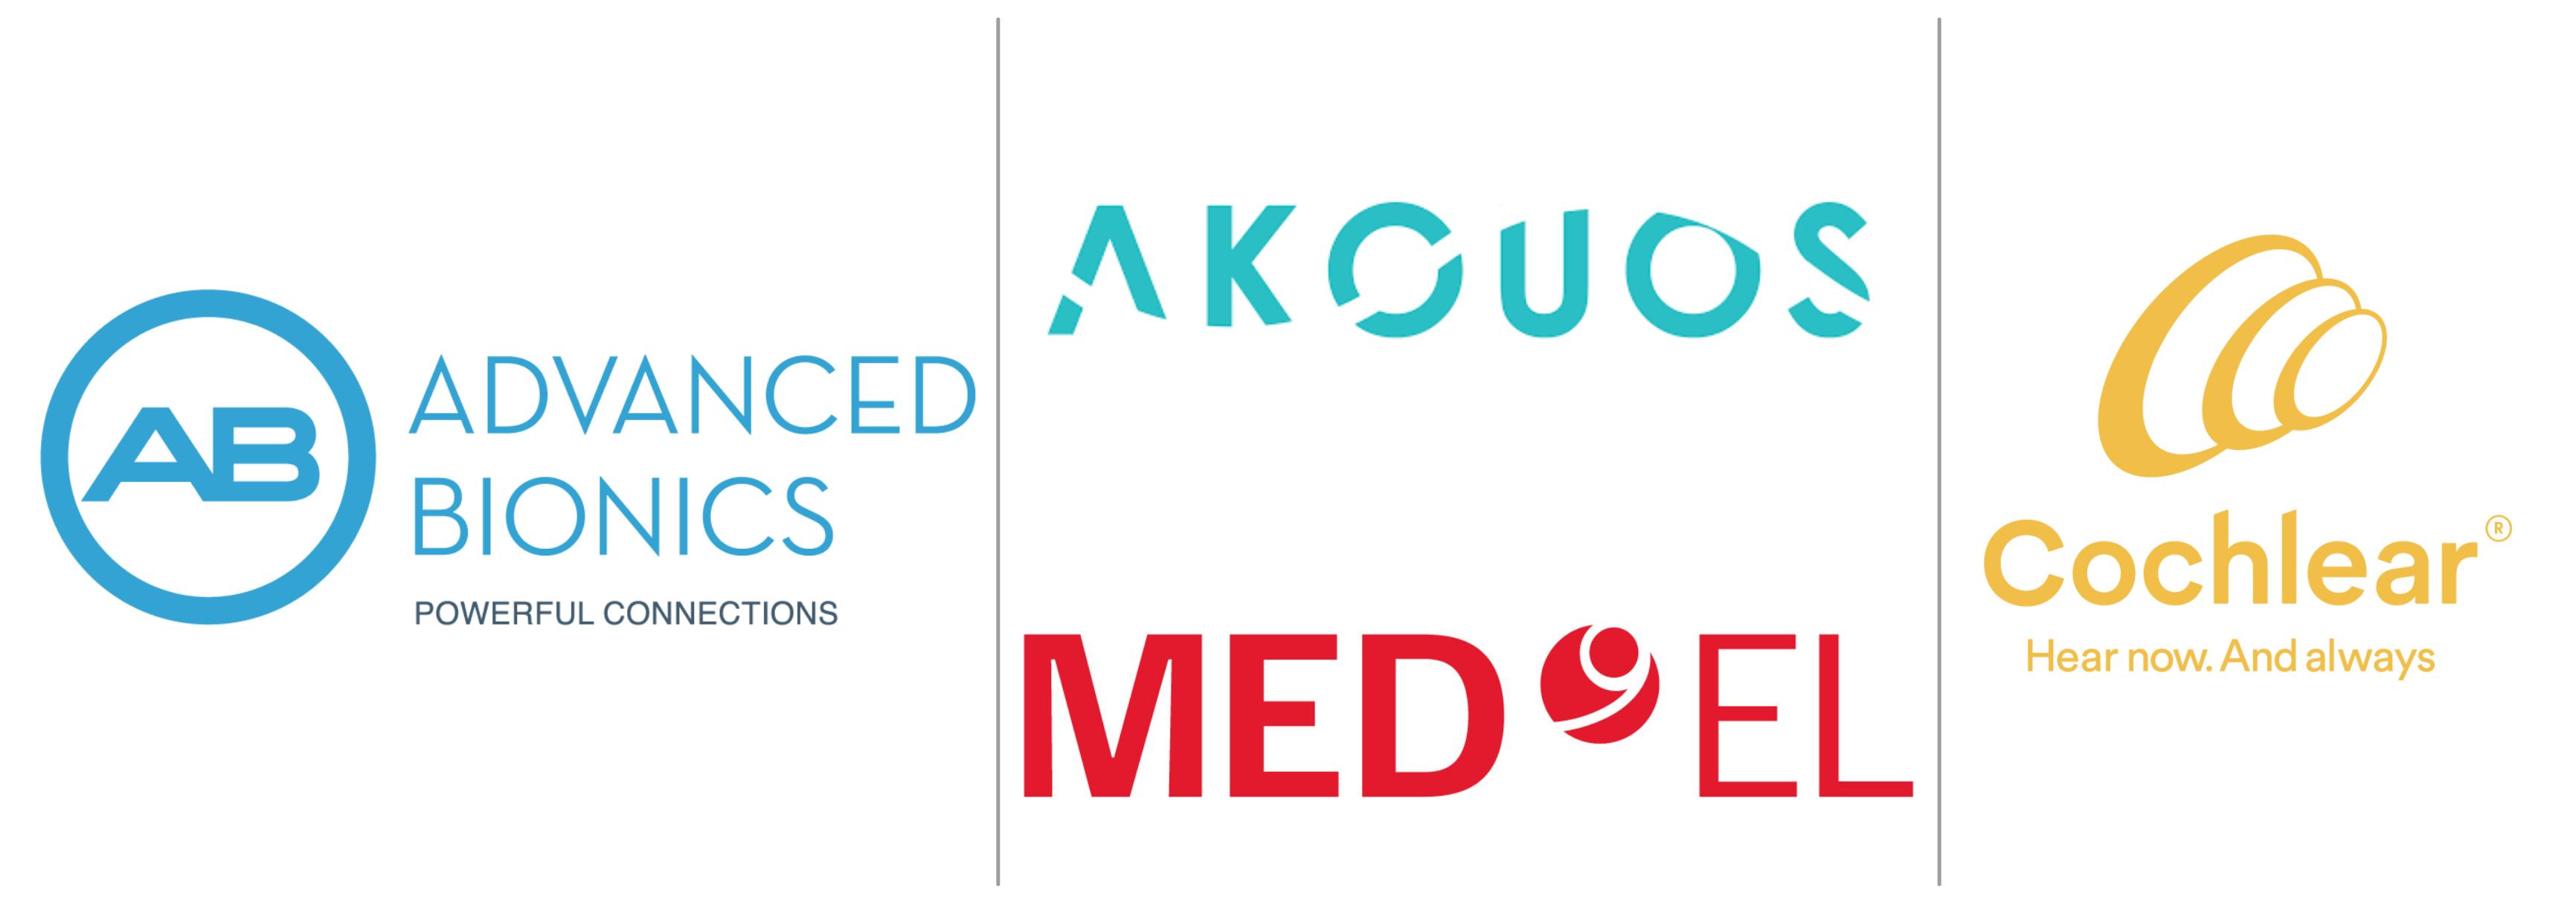 Bronze Sponsors: Advanced Bionics, Akouos, Cochlear Americas, MED-EL